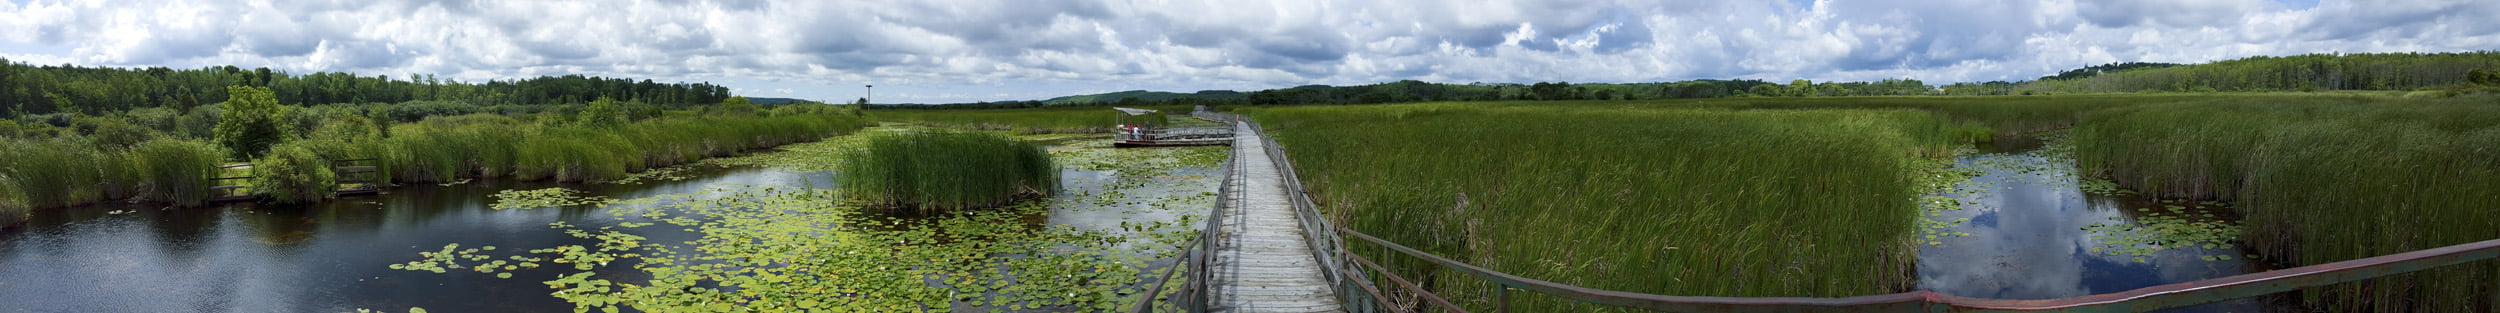 Wye Marsh in Midland